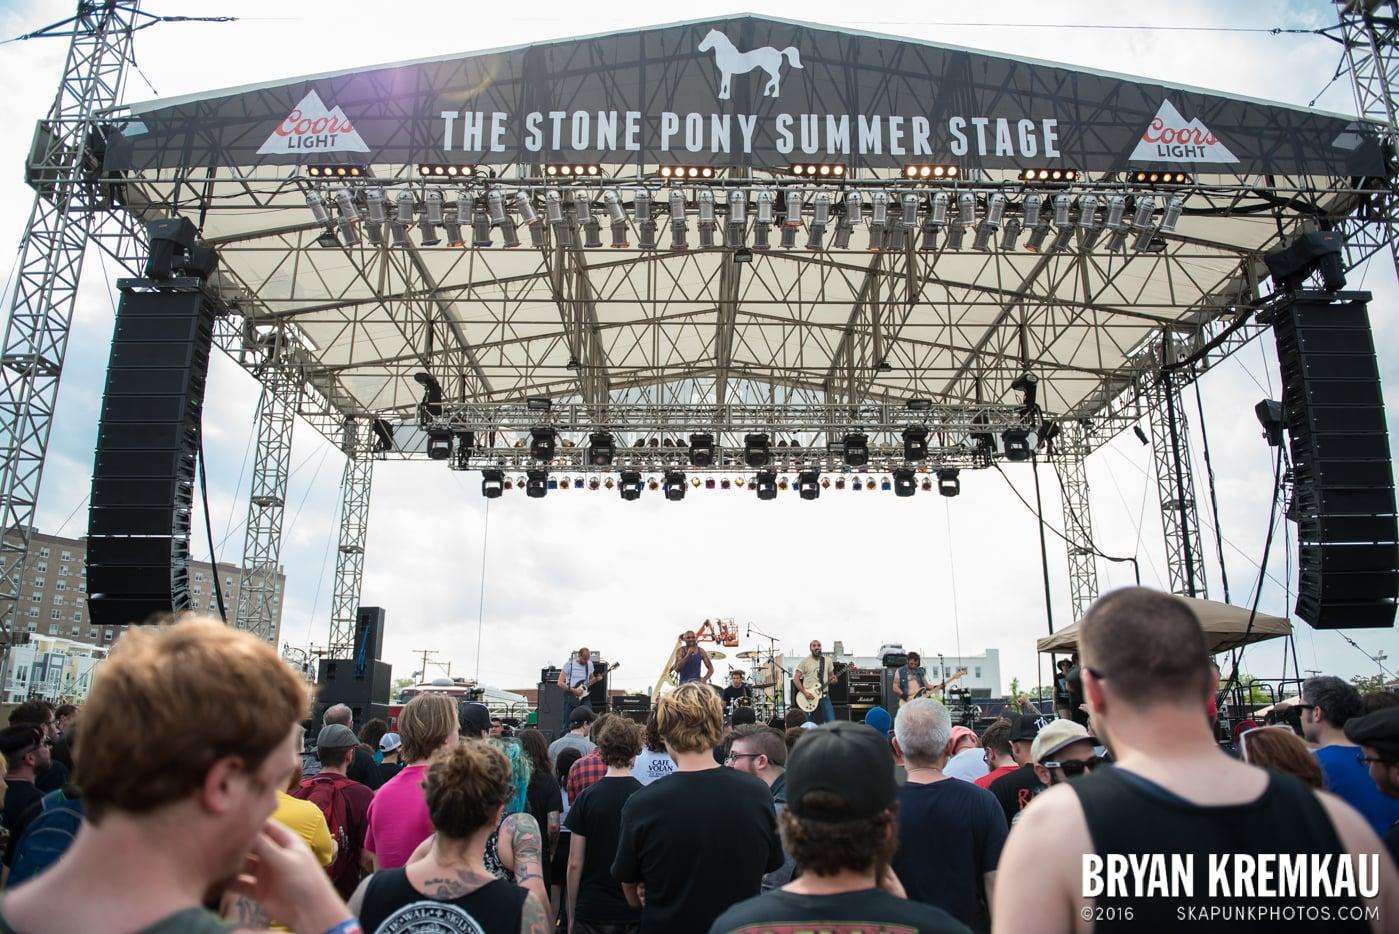 Giuda @ Punk Rock Bowling, Stone Pony Summerstage, Asbury Park, NJ - 6.11.16 (1)